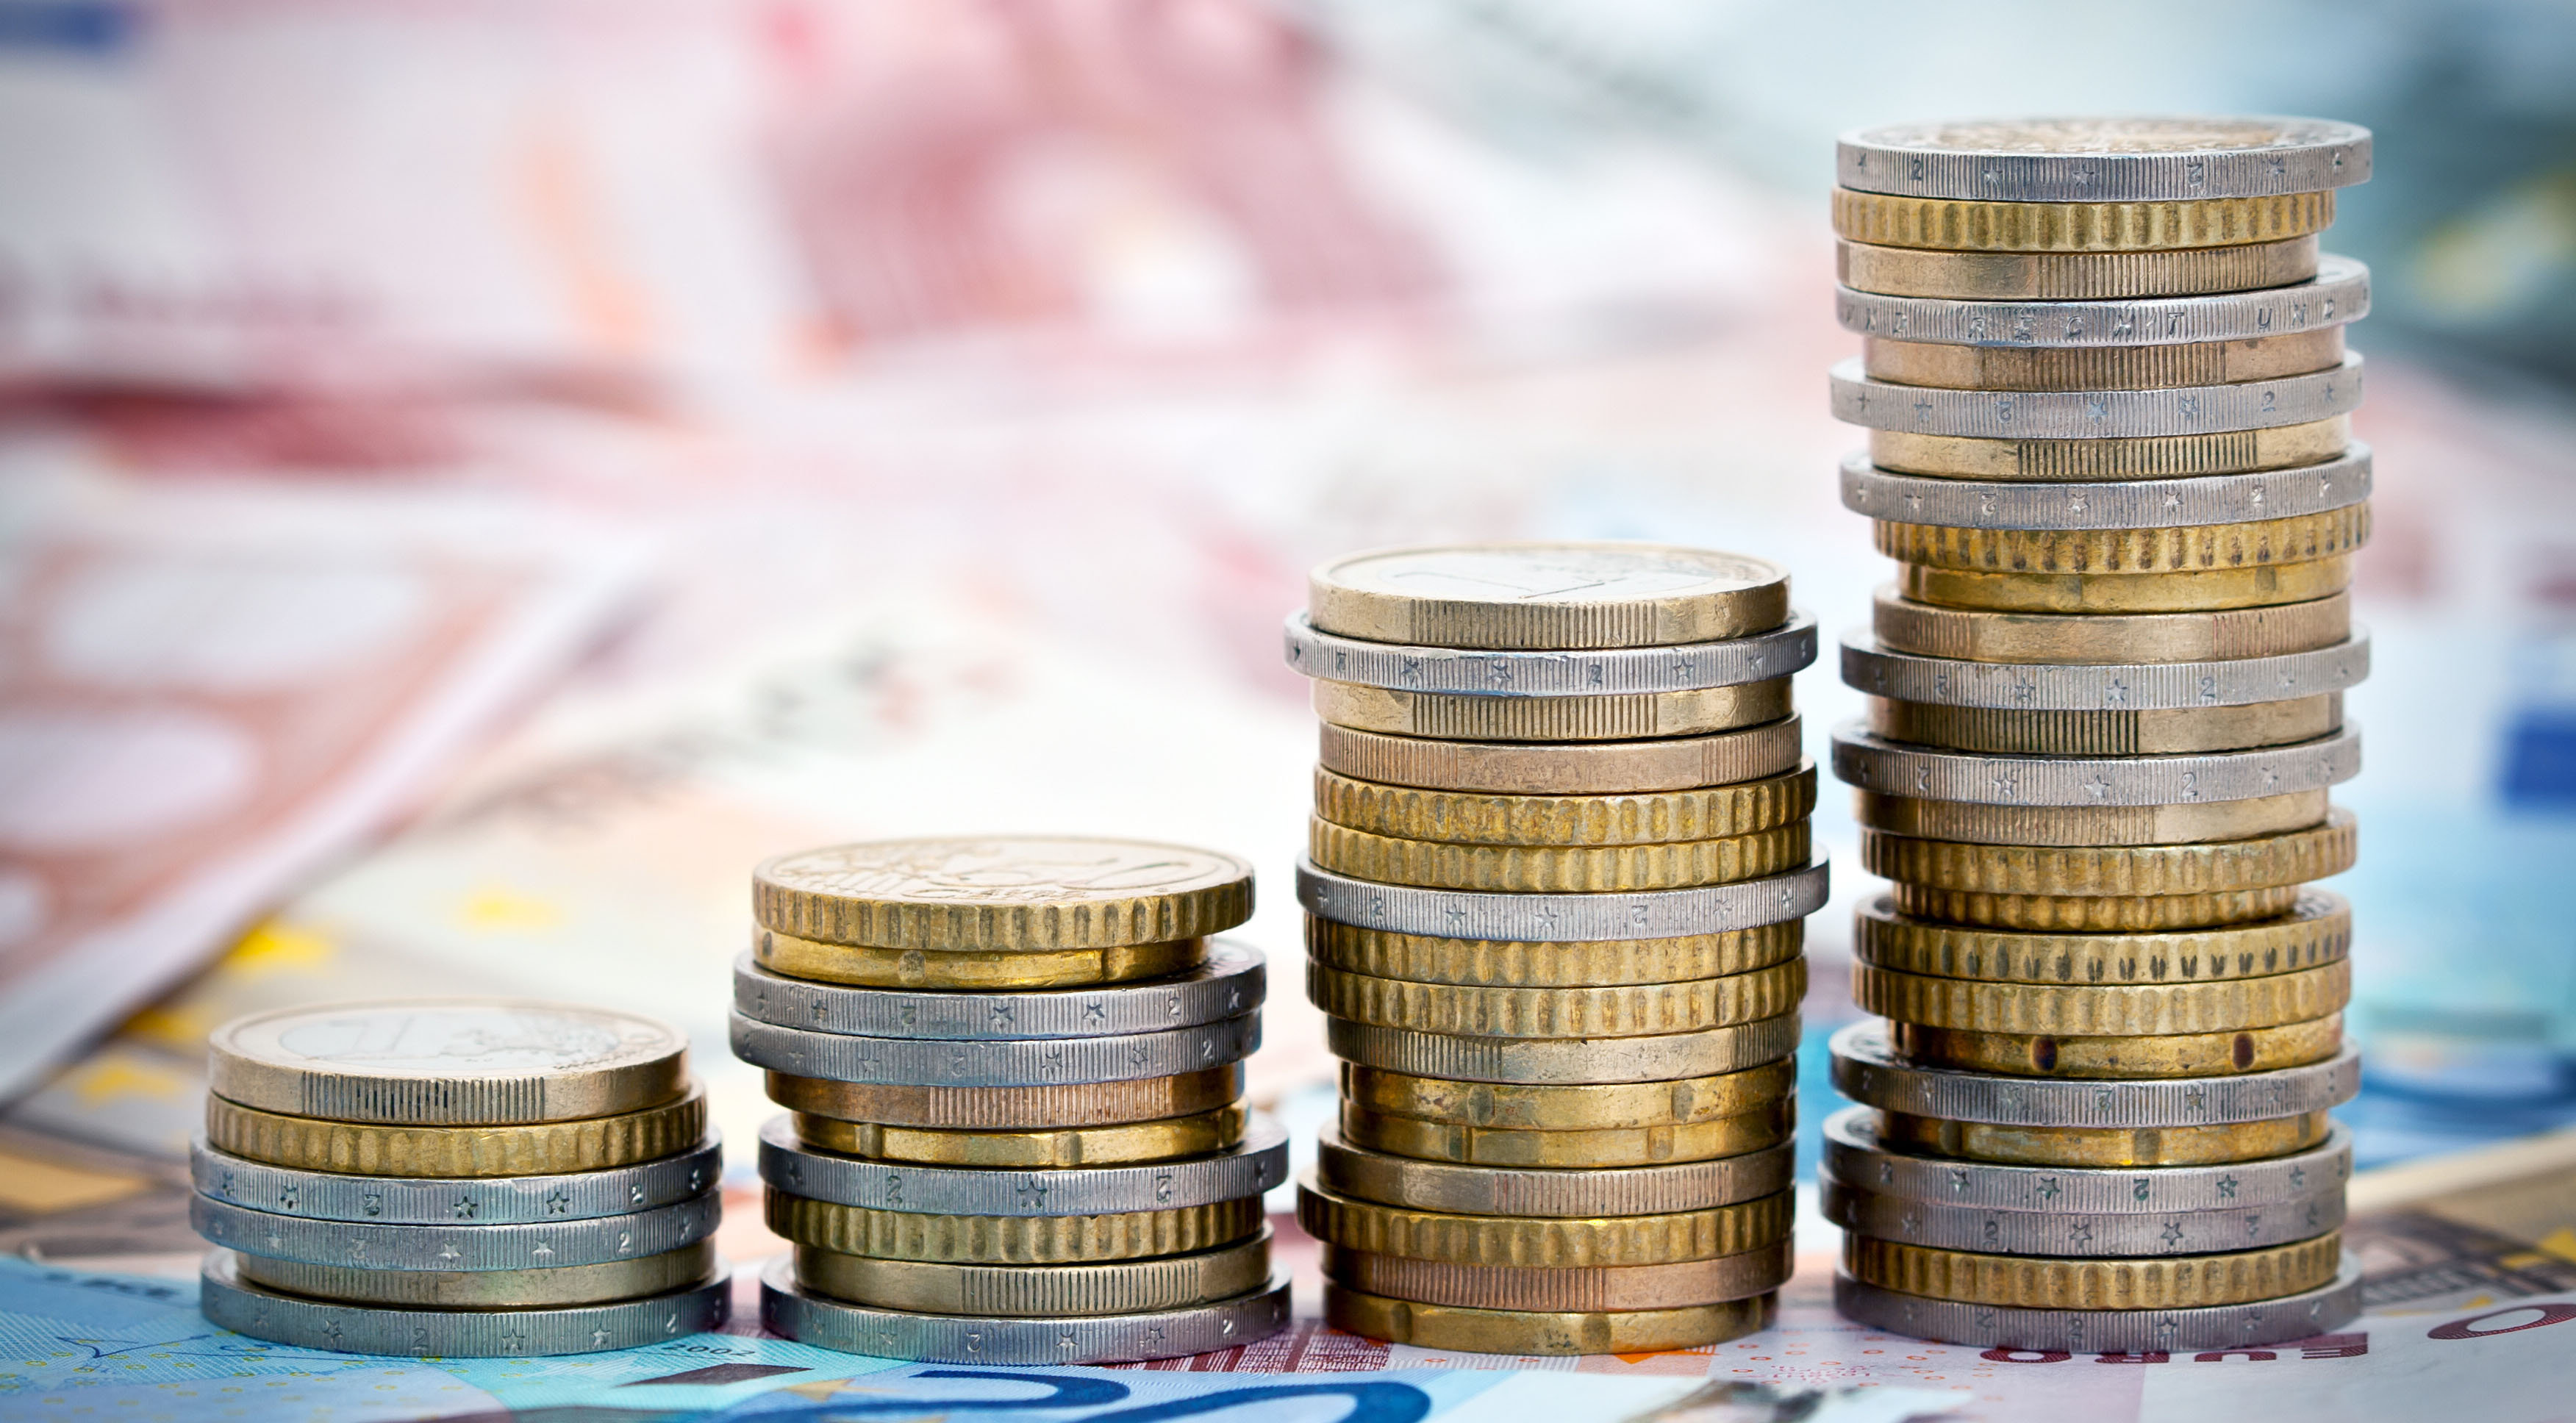 Greece records huge primary surplus of 4.4% – Eurostat